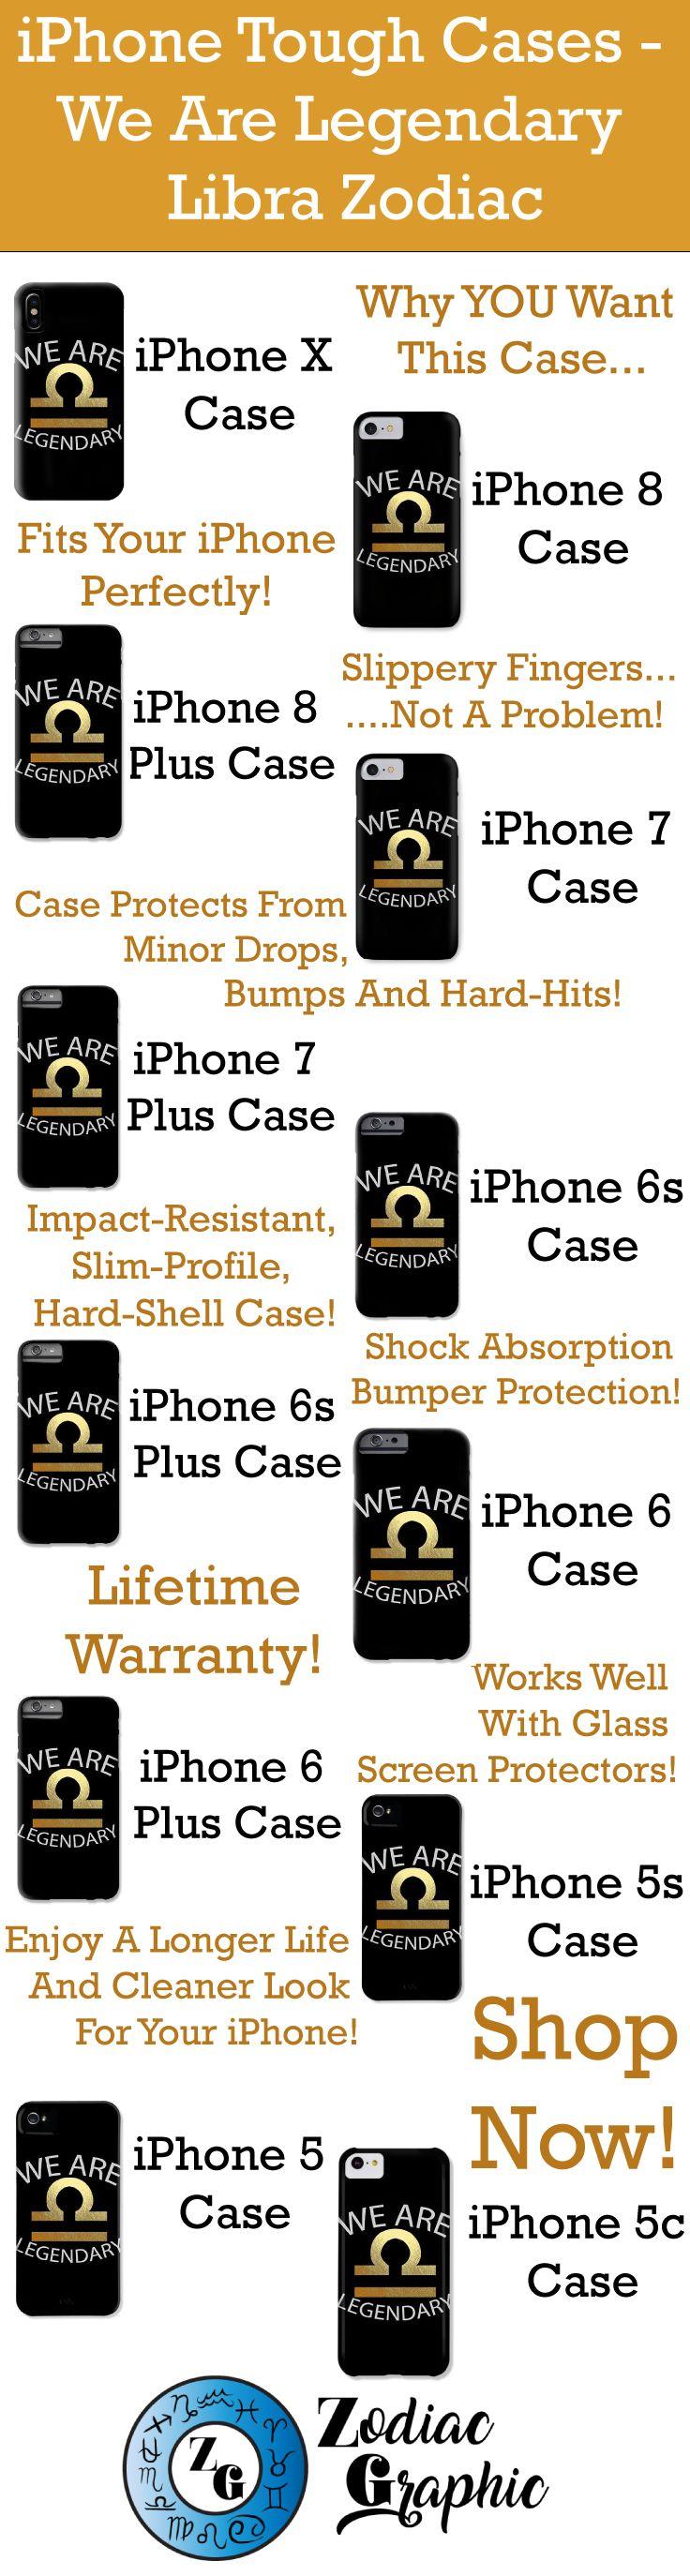 iPhoneX || iPhone 8 || iPhone 8 Plus || iPhone 7 || iPhone 7 Plus || iPhone 6s || iPhone 6s Plus || iPhone 6 || iPhone 6 Plus || iPhone 5s || iPhone 5 || iPhone 5c || We Are Legendary Libra - Phone Case || Zodiac || Zodiac Sign || Zodiac Gift || Libra || Libra Zodiac Gift || Gift For Libra || September Birthday Gift || October Birthday Gift